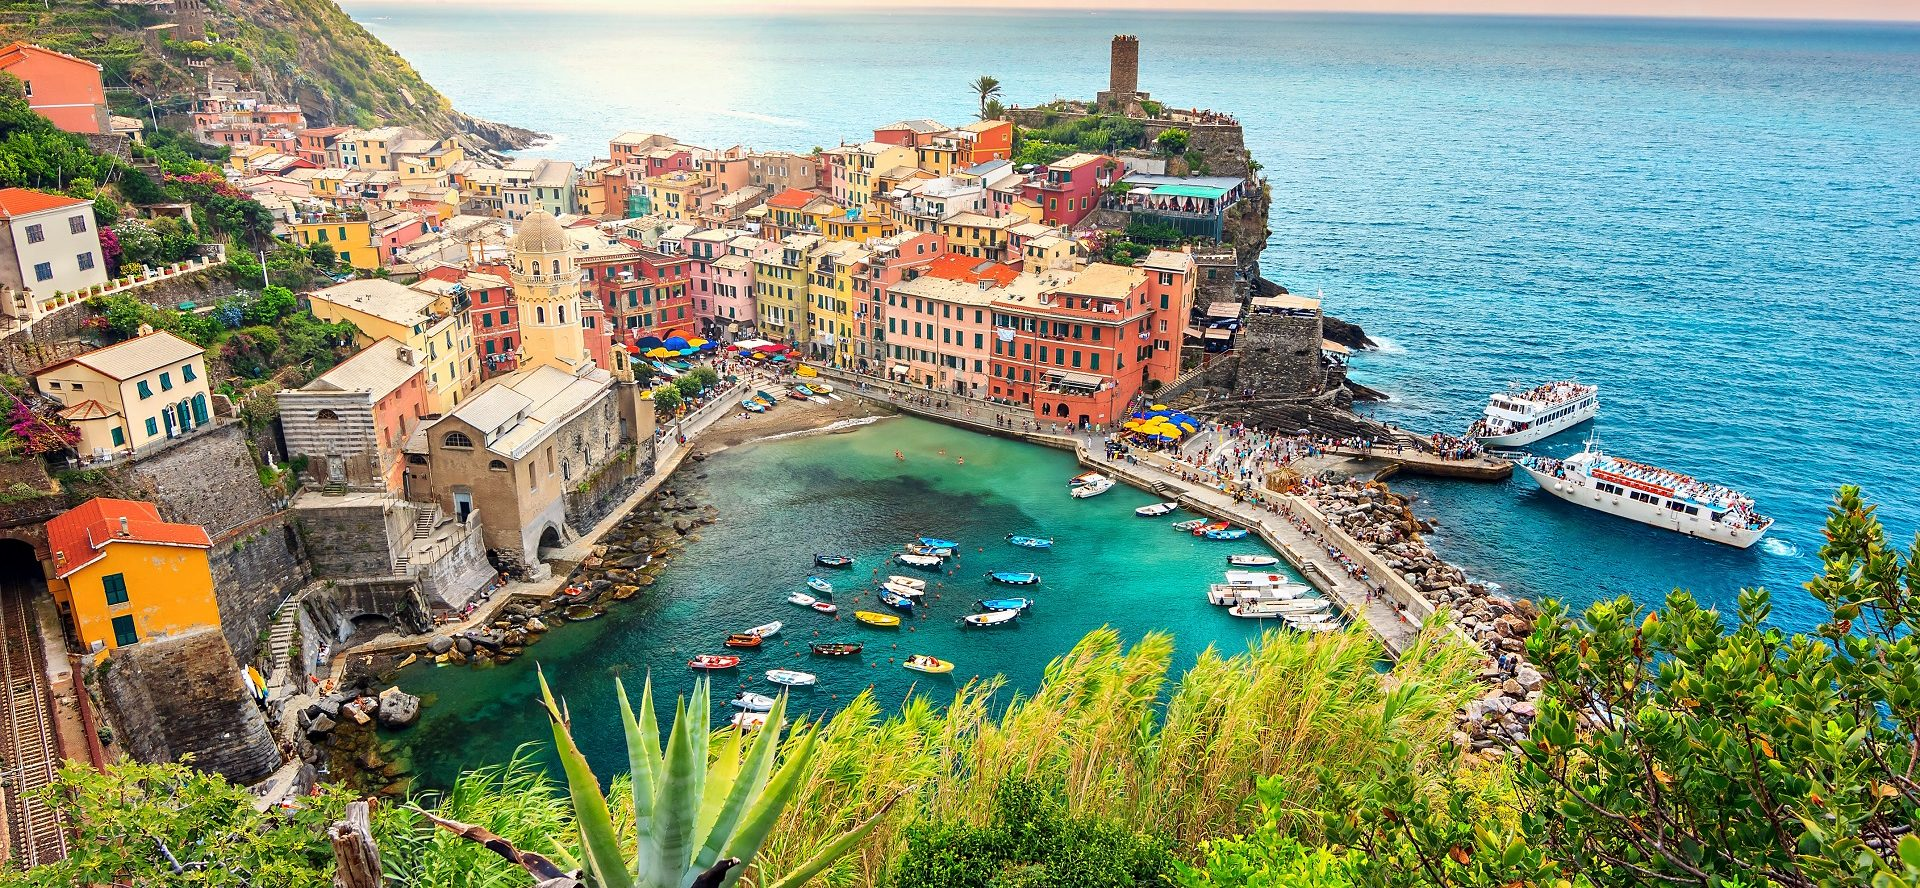 Het nationale park Cinque Terre bloemenriviera